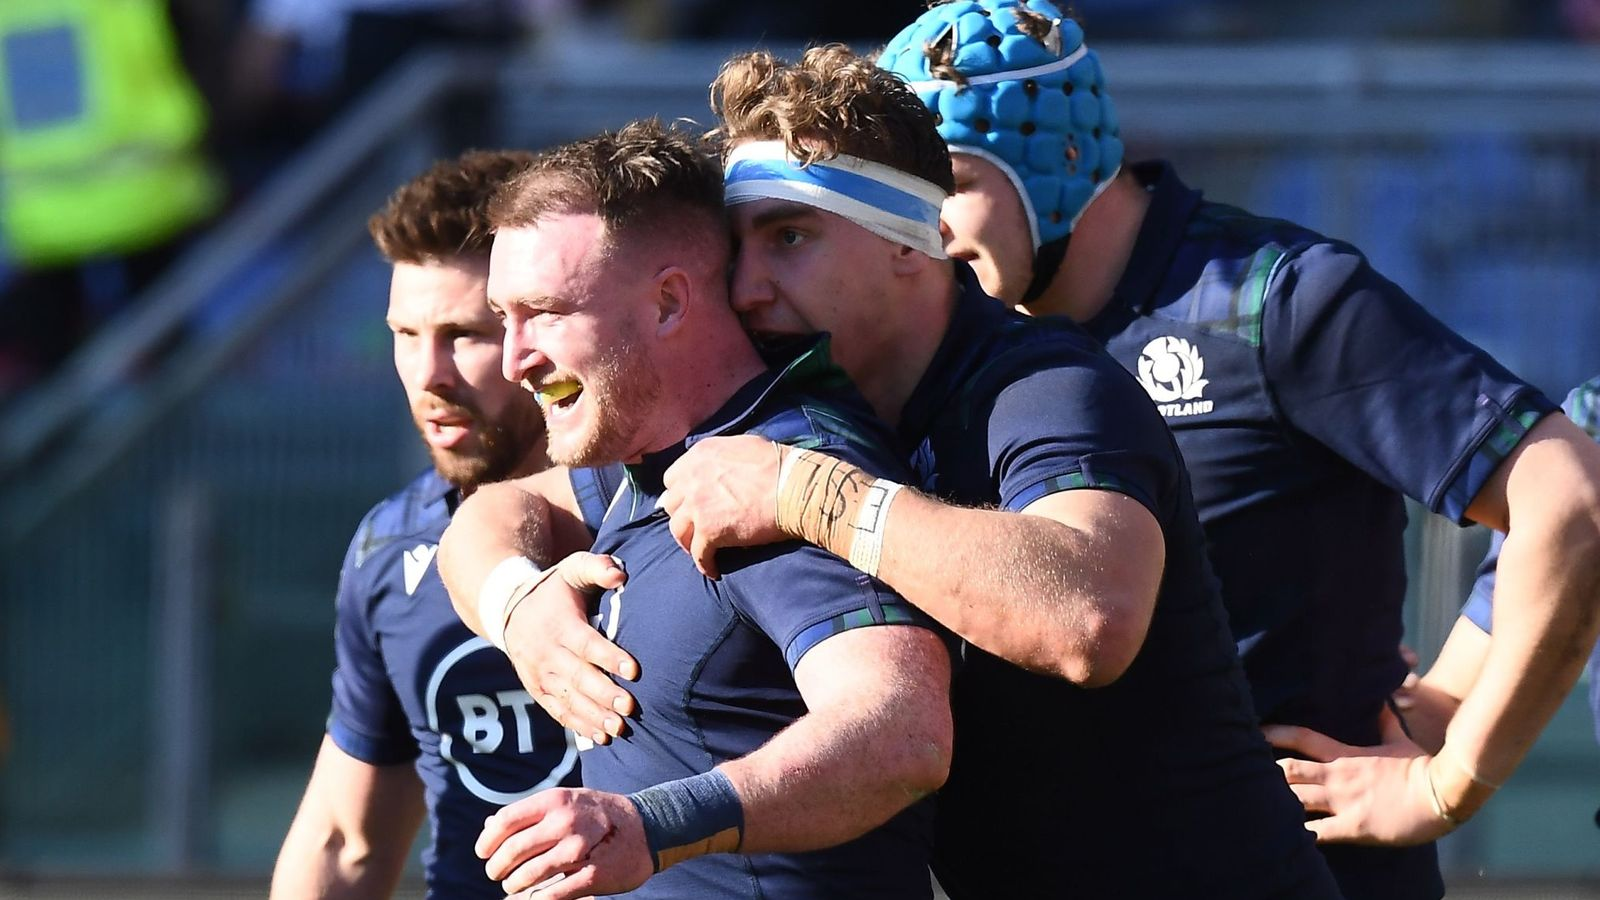 Italy 0-17 Scotland: Lacklustre Scots struggle past Azzurri